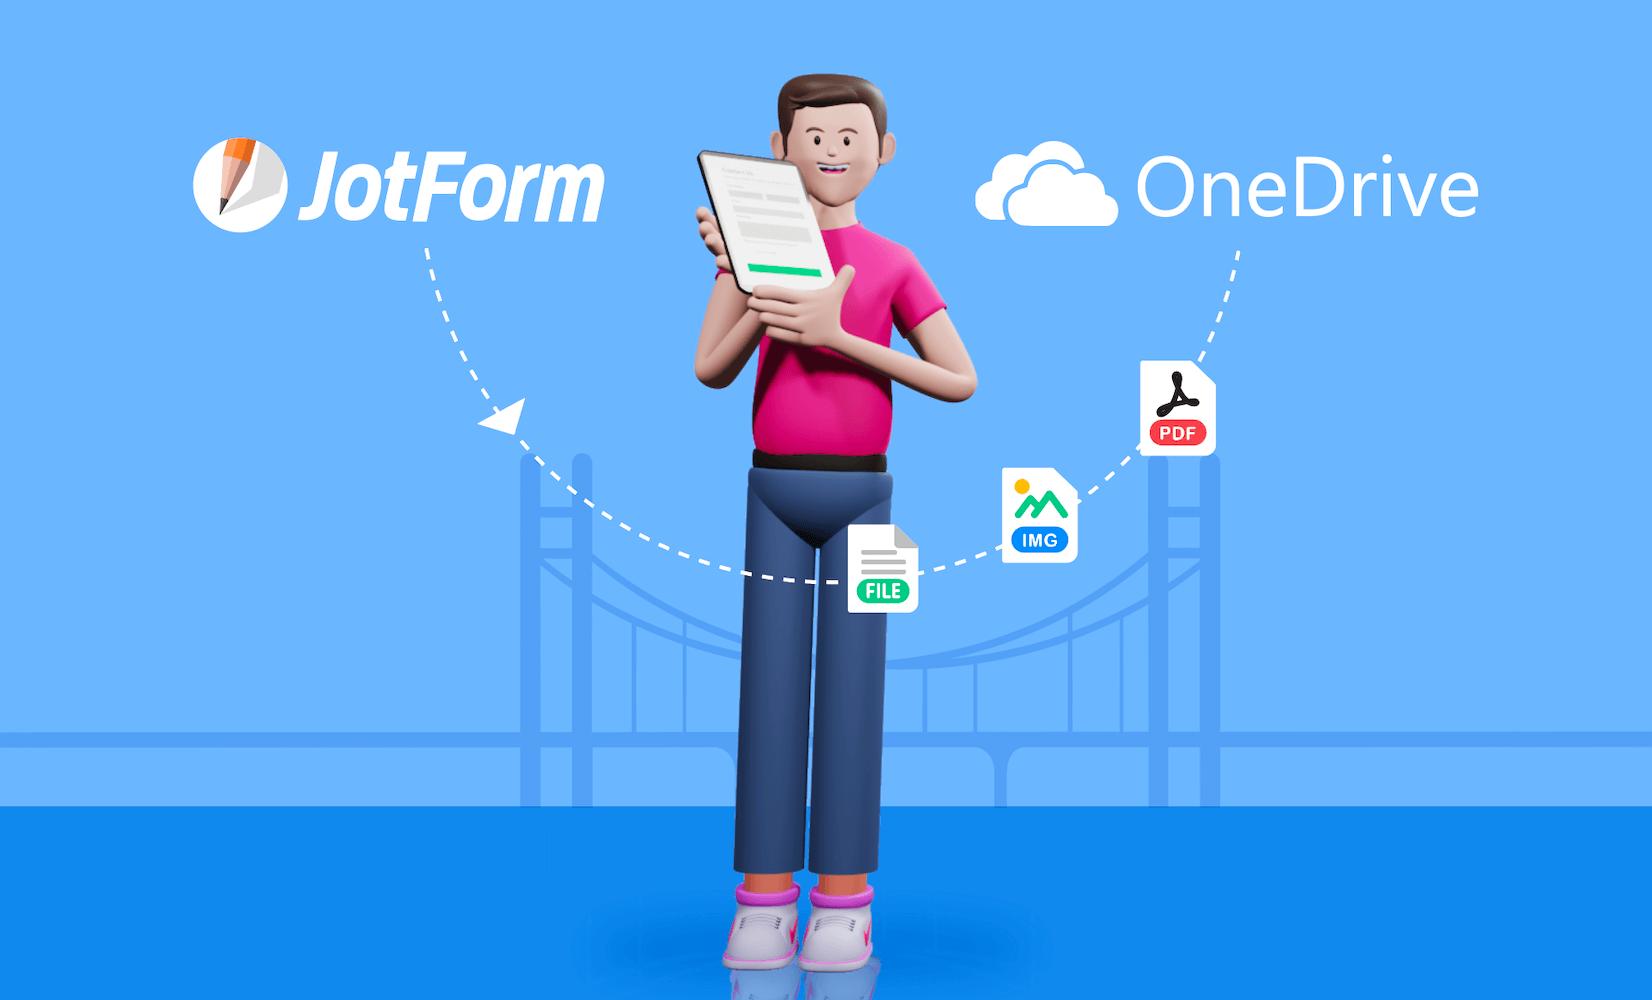 Announcing JotForm's OneDrive integration